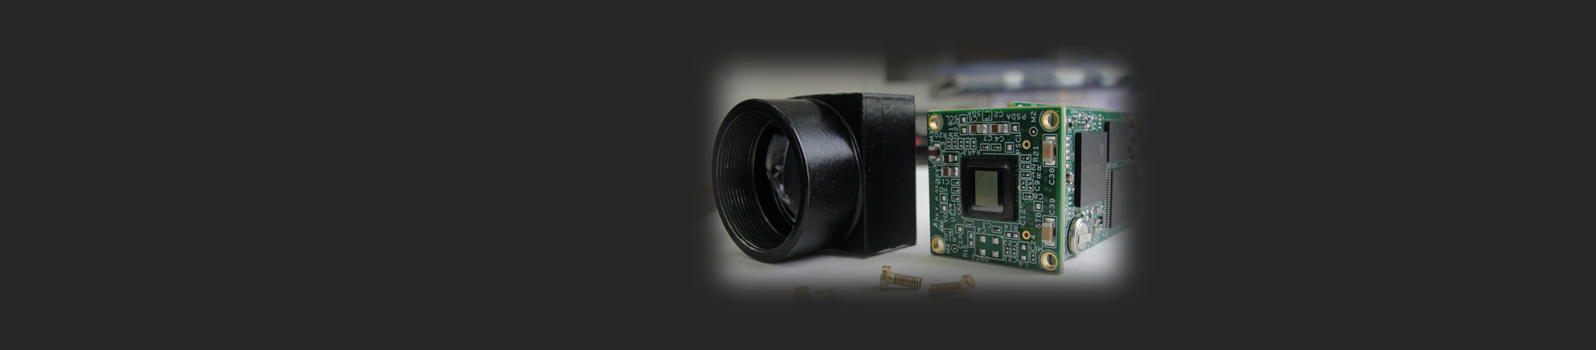 OEM Camera Solutions